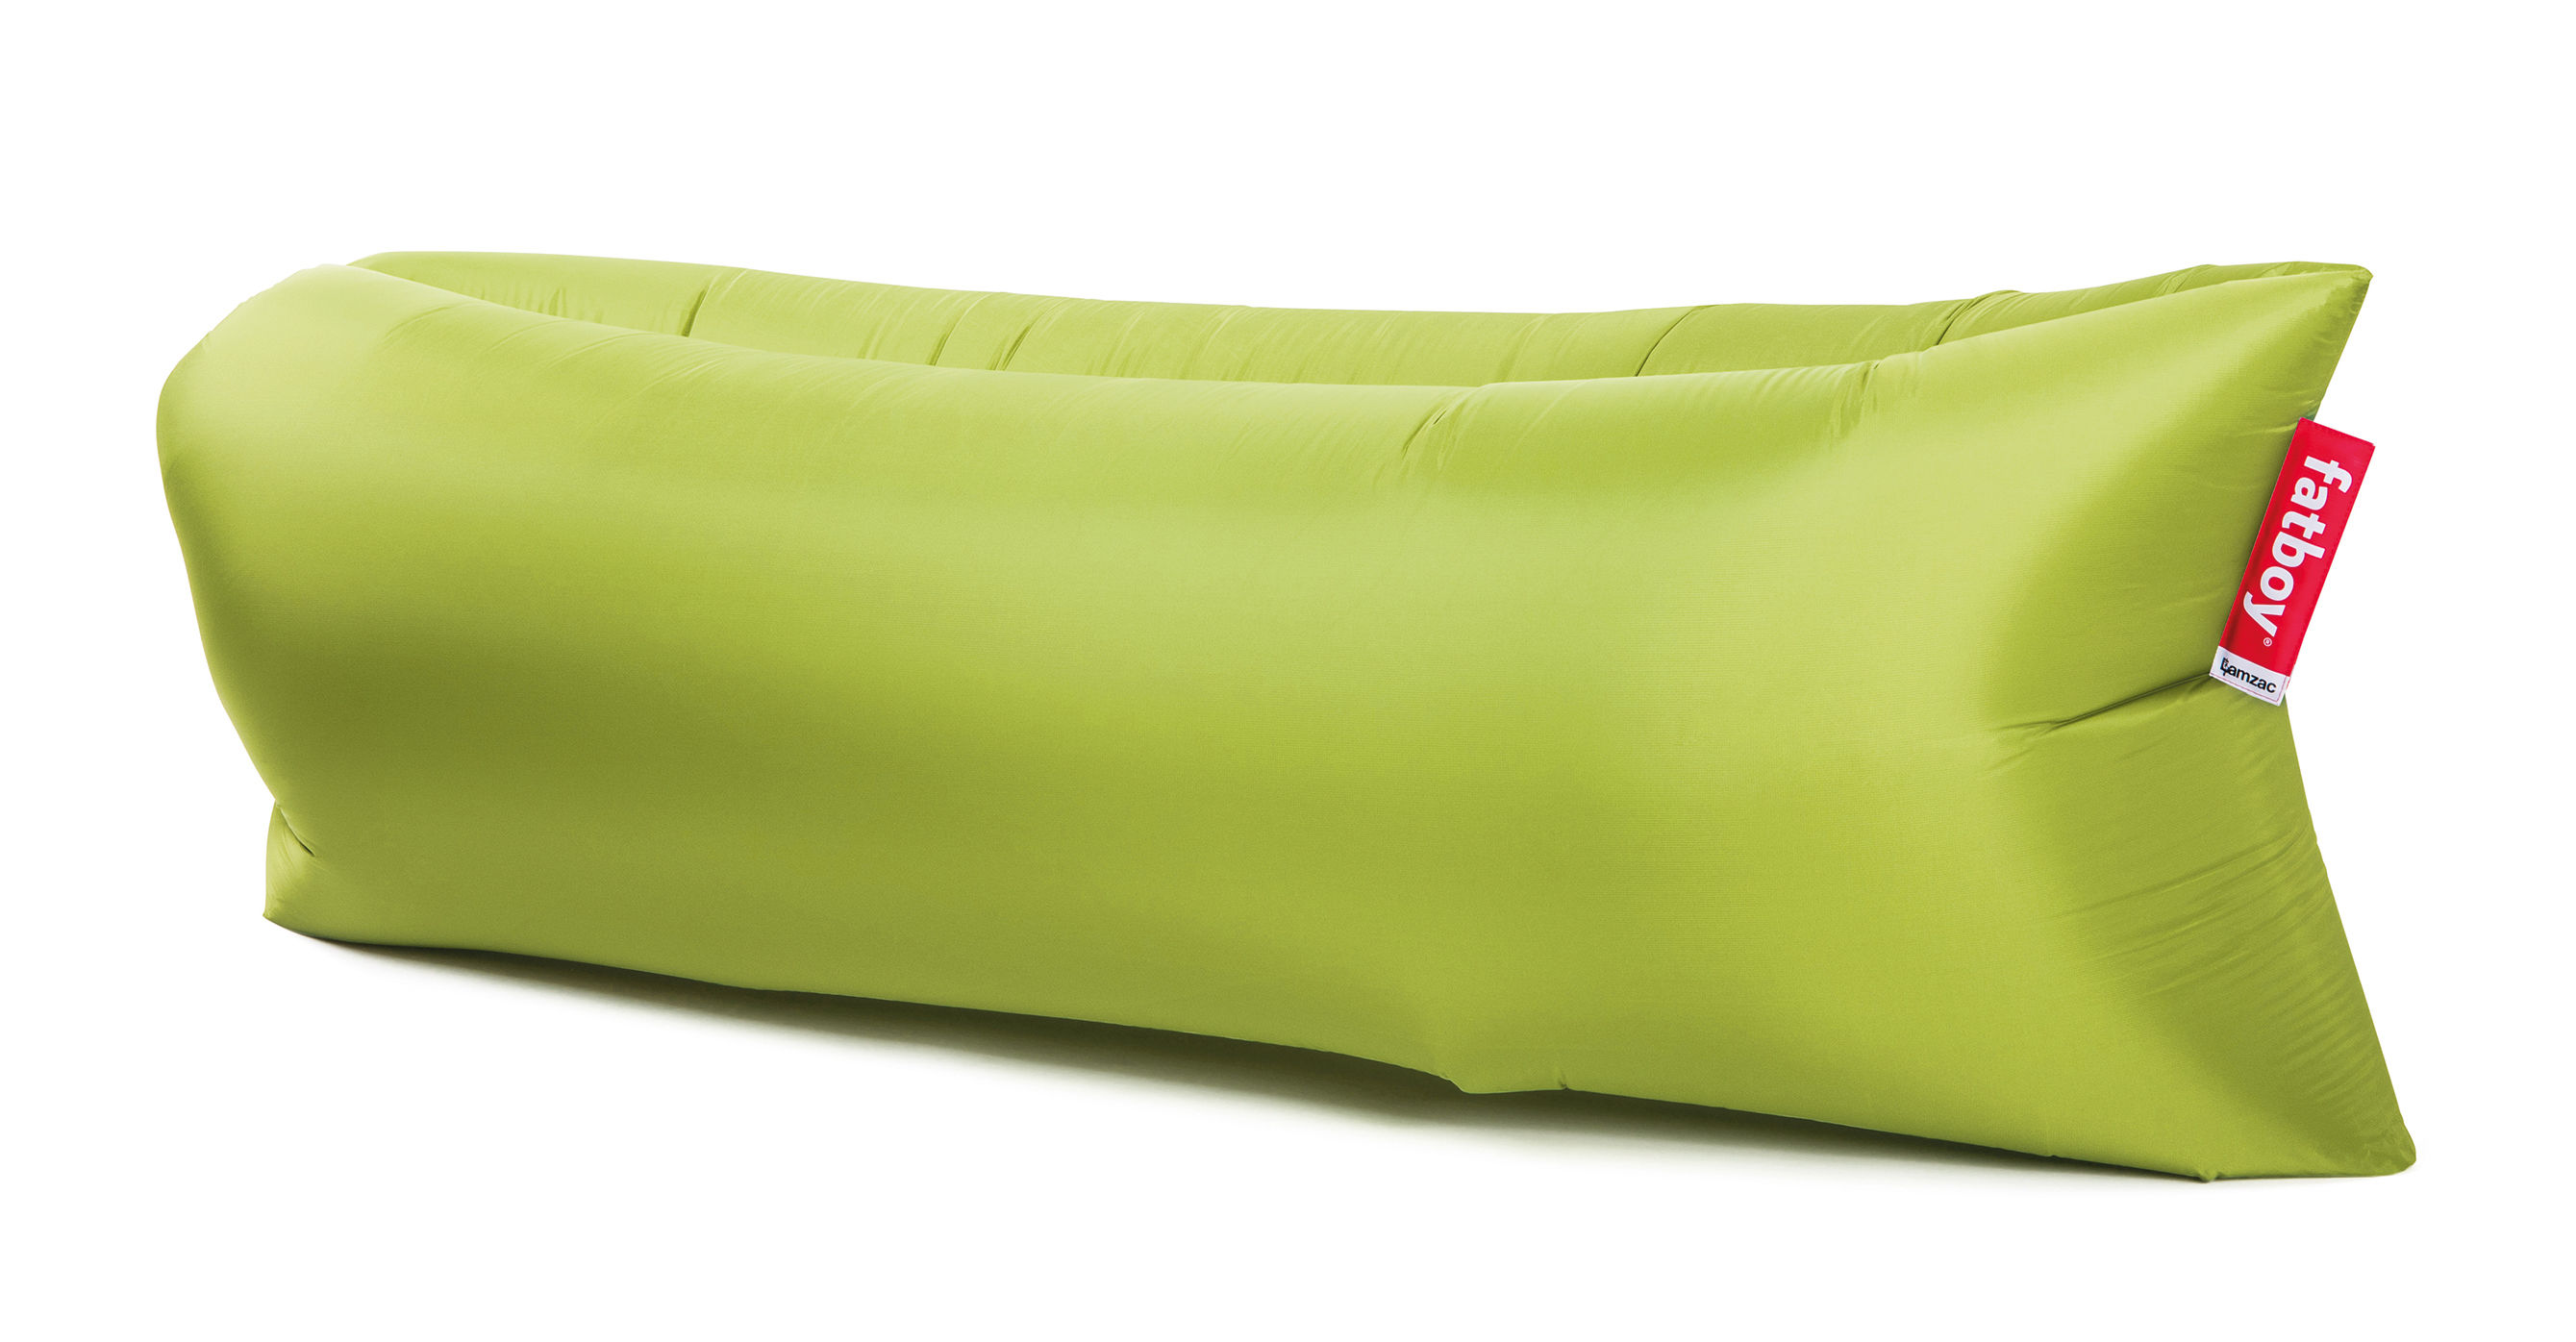 pouf gonflable lamzac the original 2 0 l 200 cm vert lime fatboy. Black Bedroom Furniture Sets. Home Design Ideas